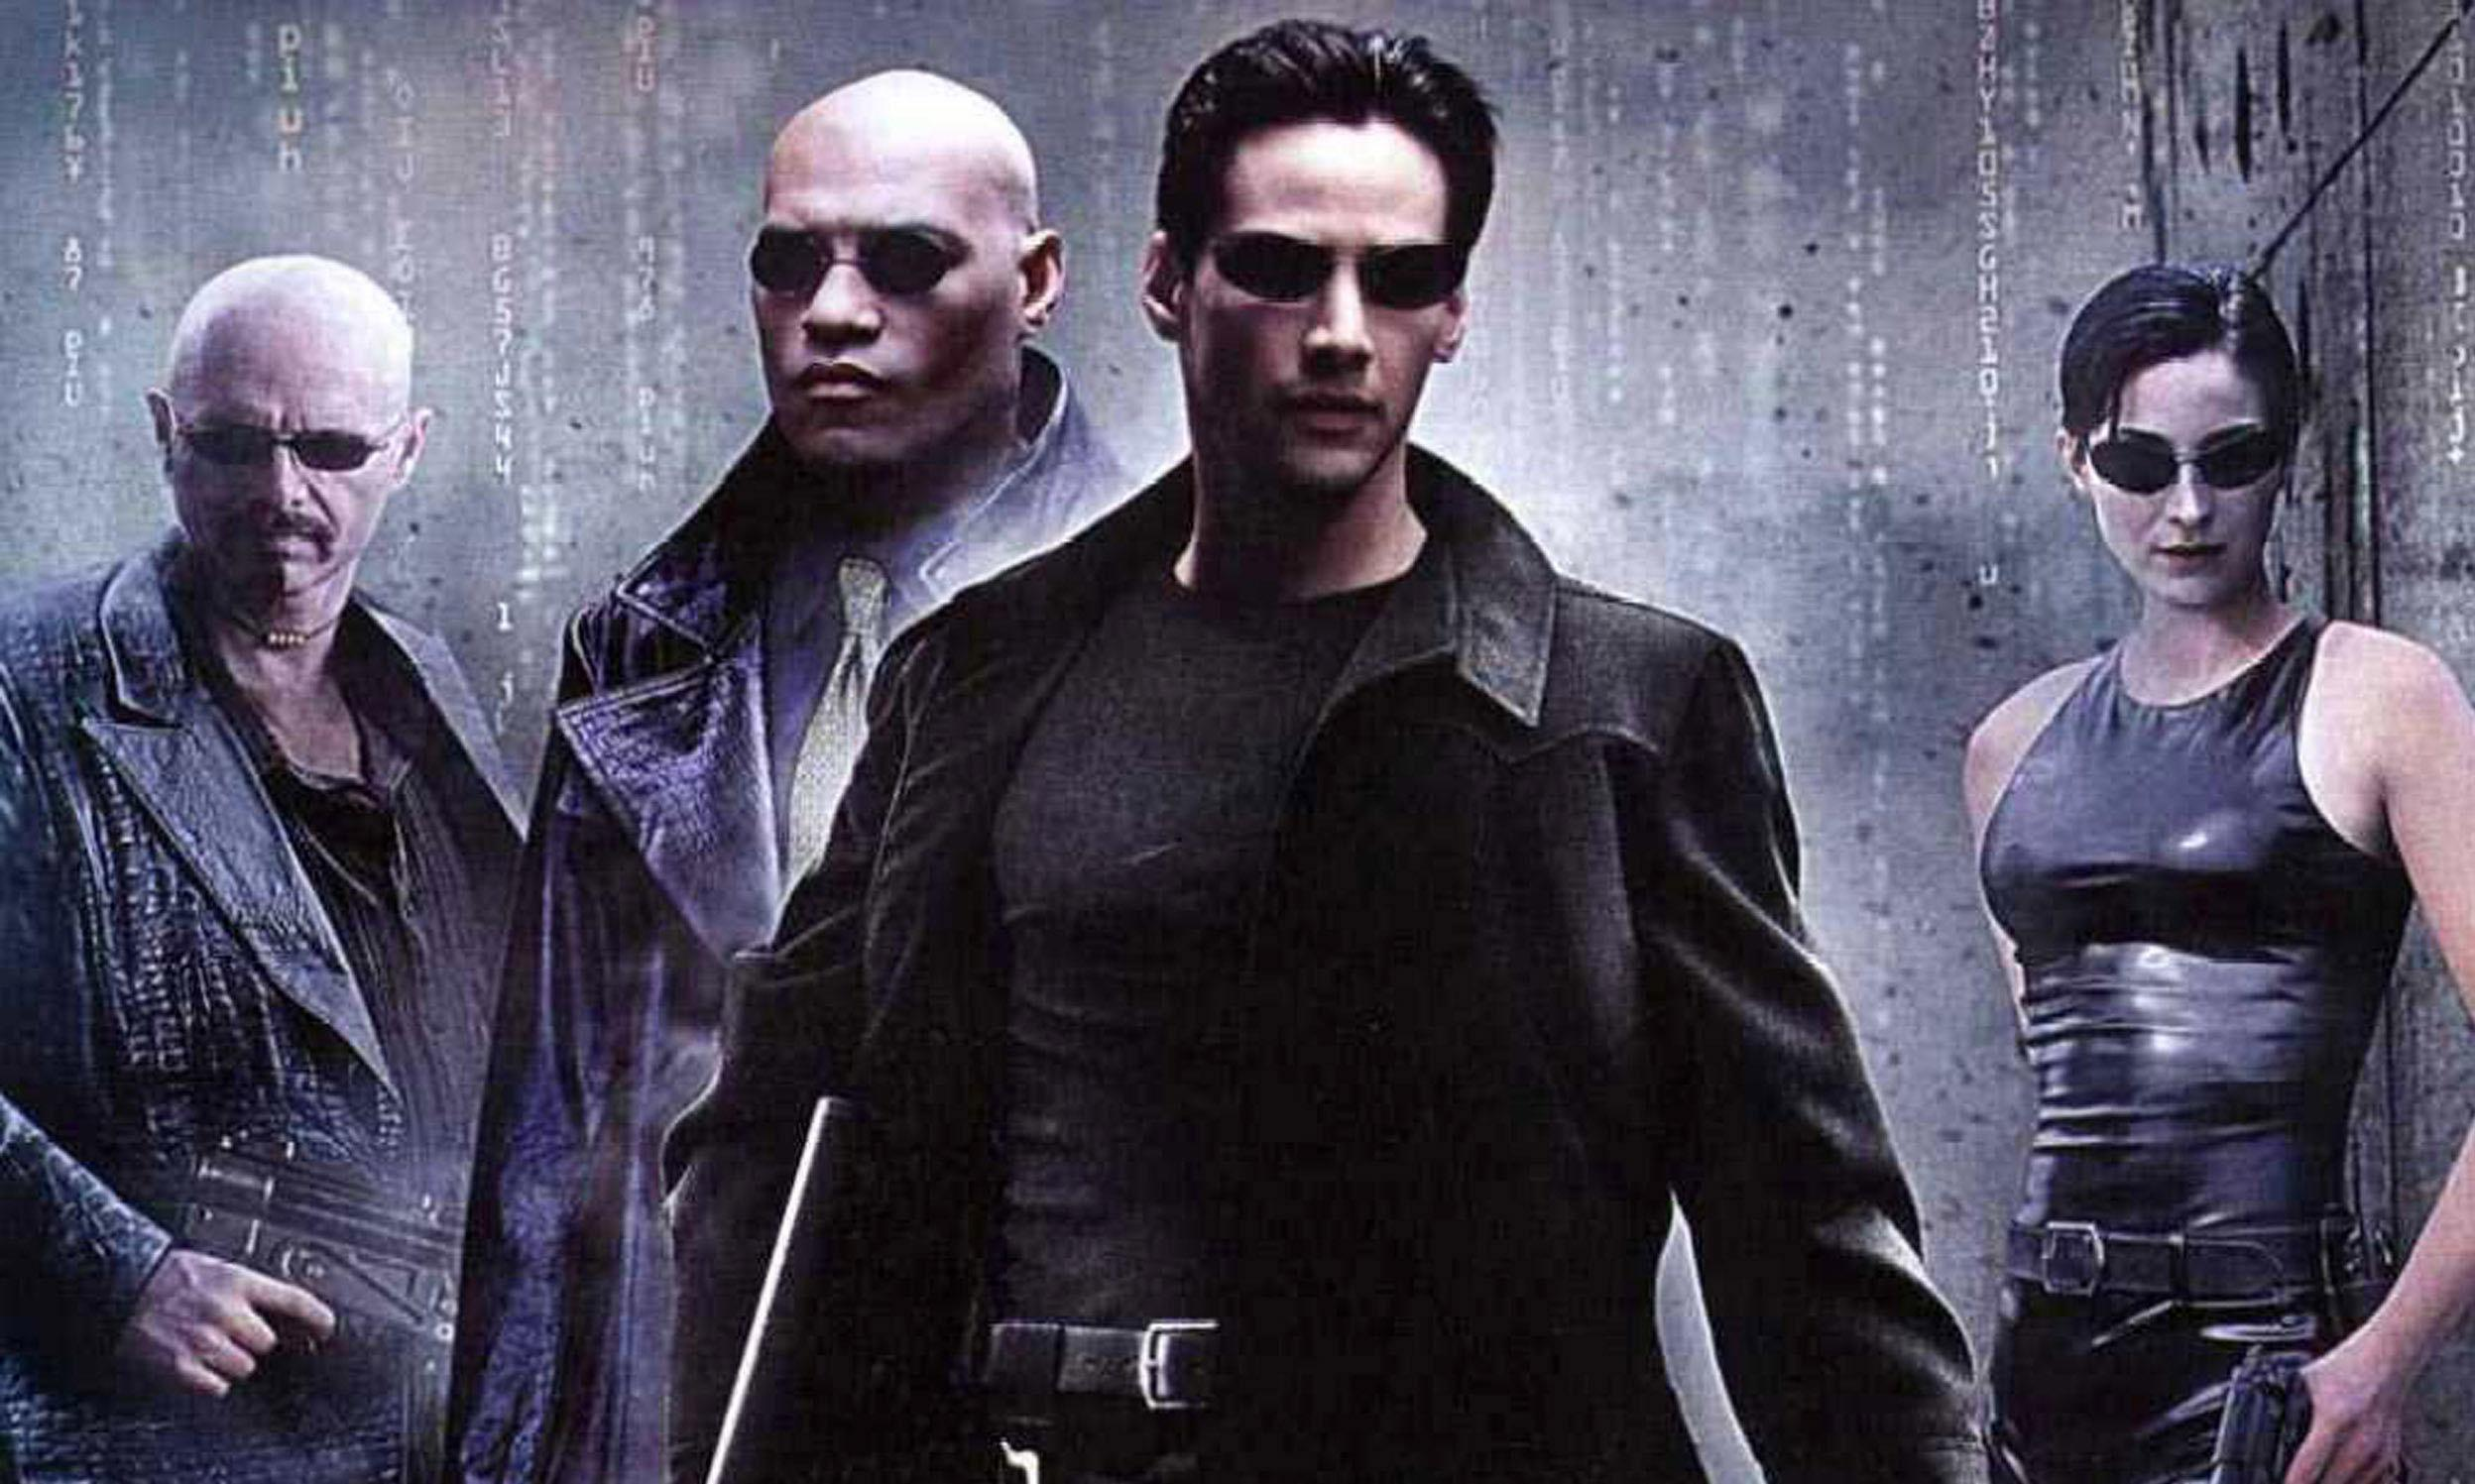 The Matrix trilogy review – pop-culture juggernaut still lands a thrilling punch